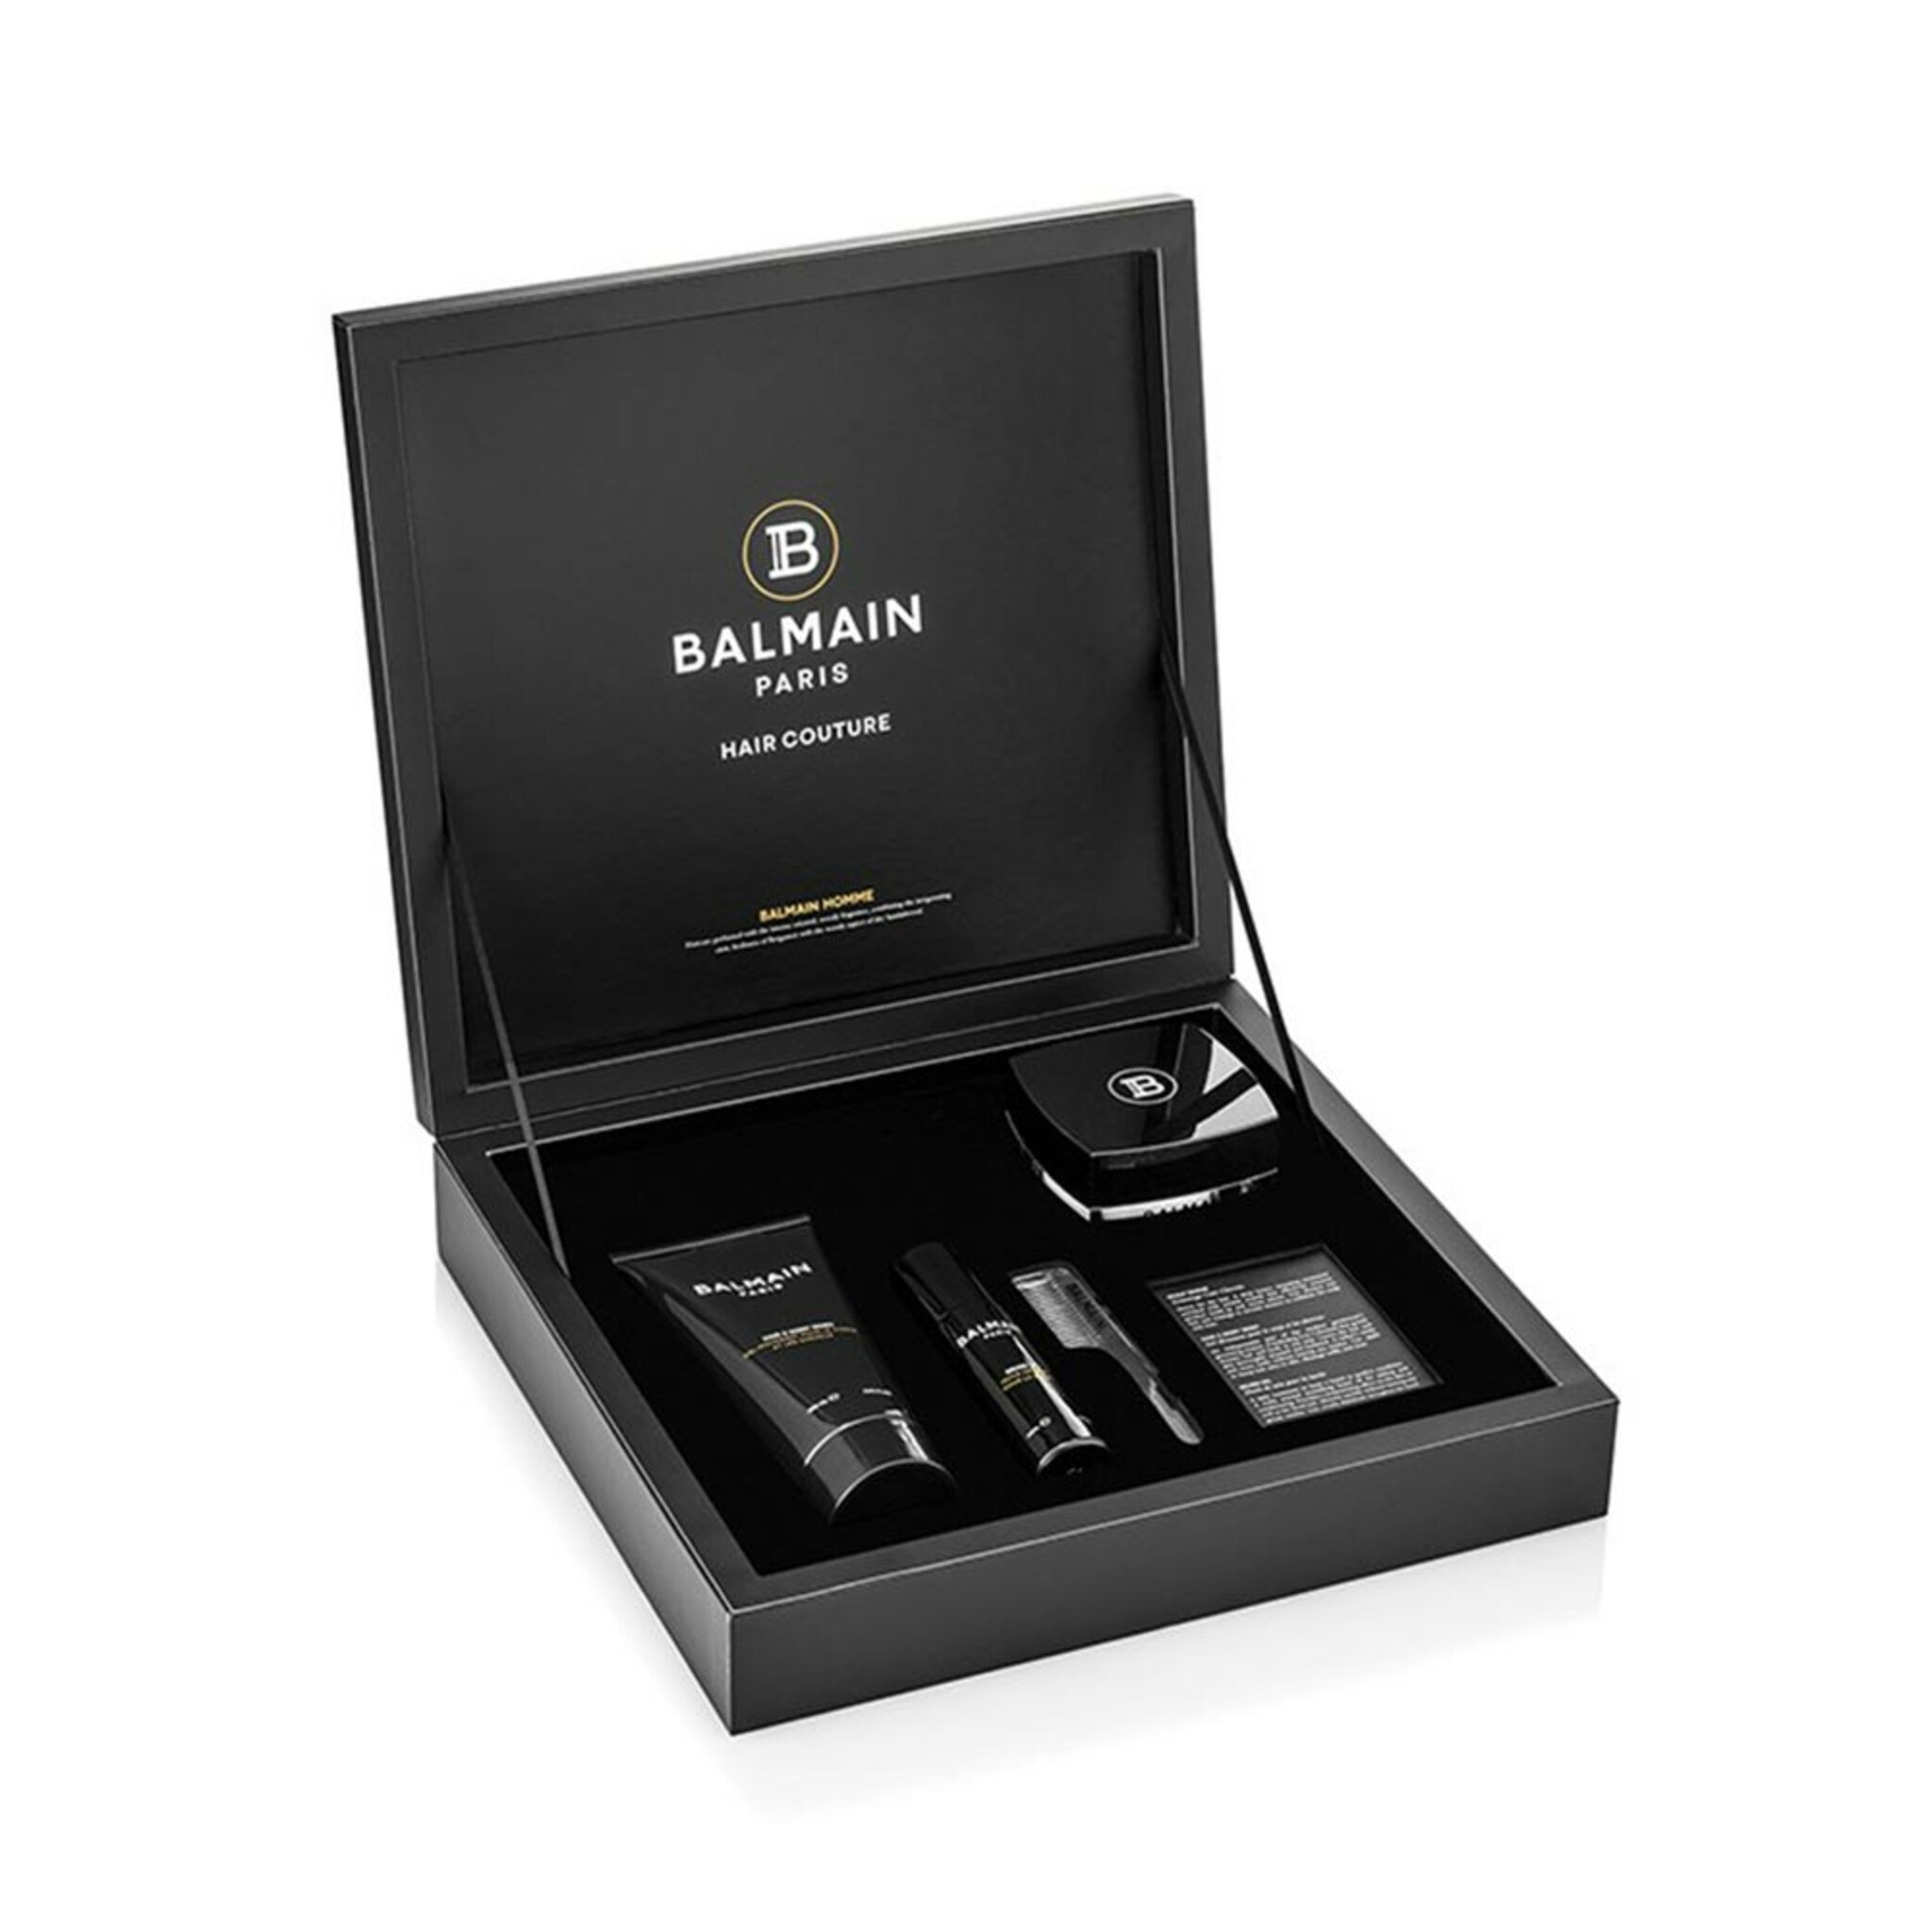 Balmain Signature Men't Giftset (Beard Oil, Hair & Body Wash, Scalp